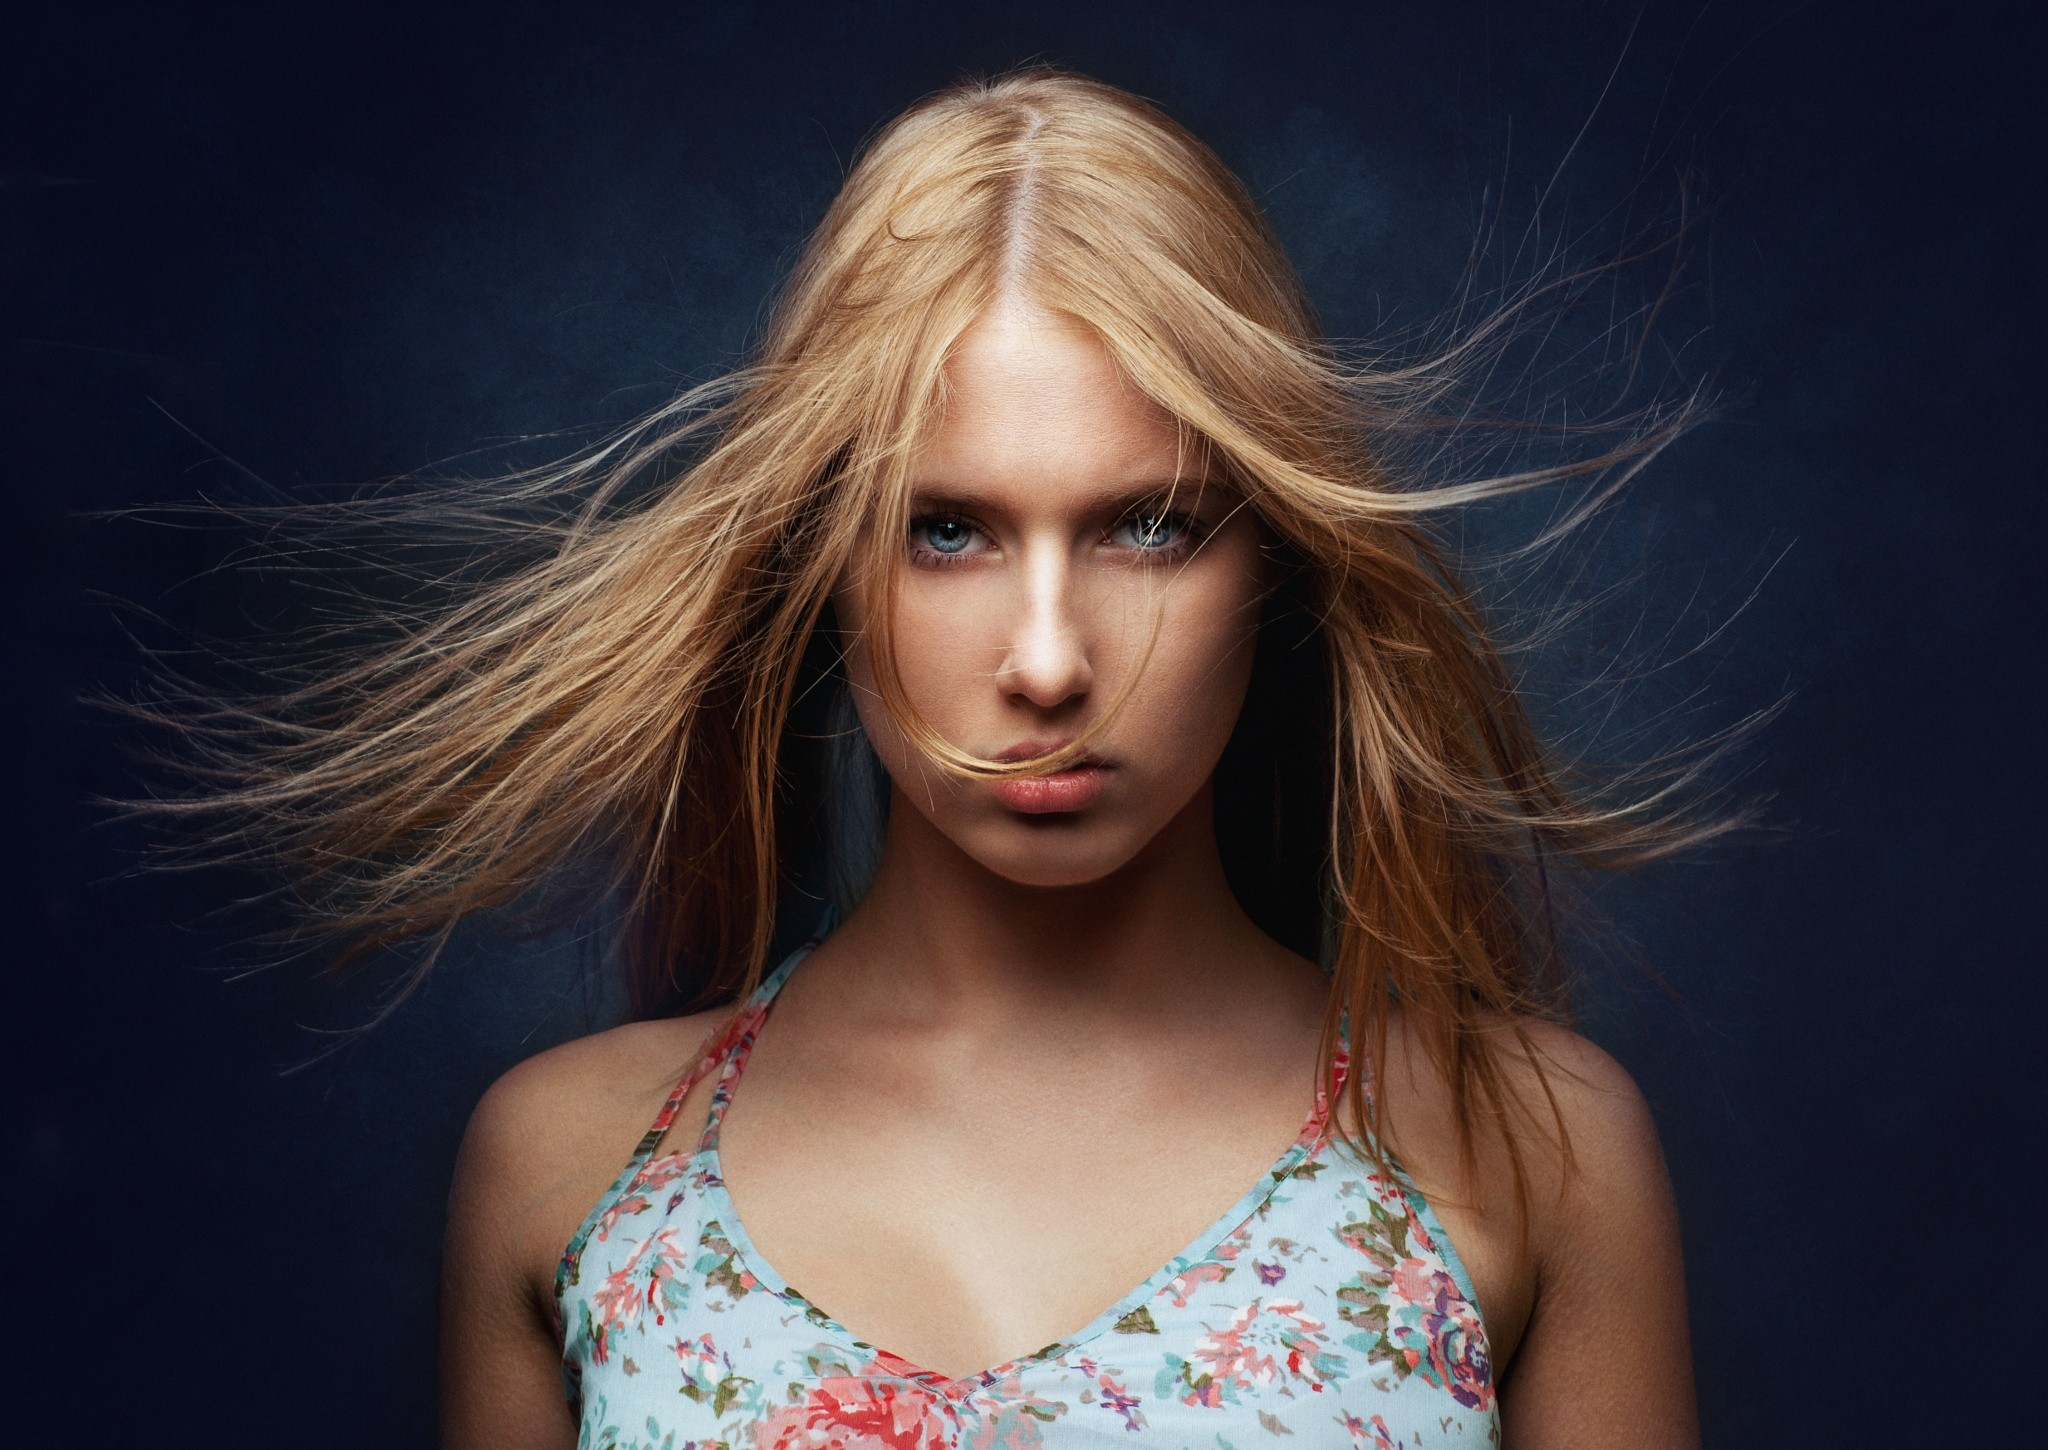 People 2048x1450 women blonde face portrait simple background Zachar Rise blue eyes